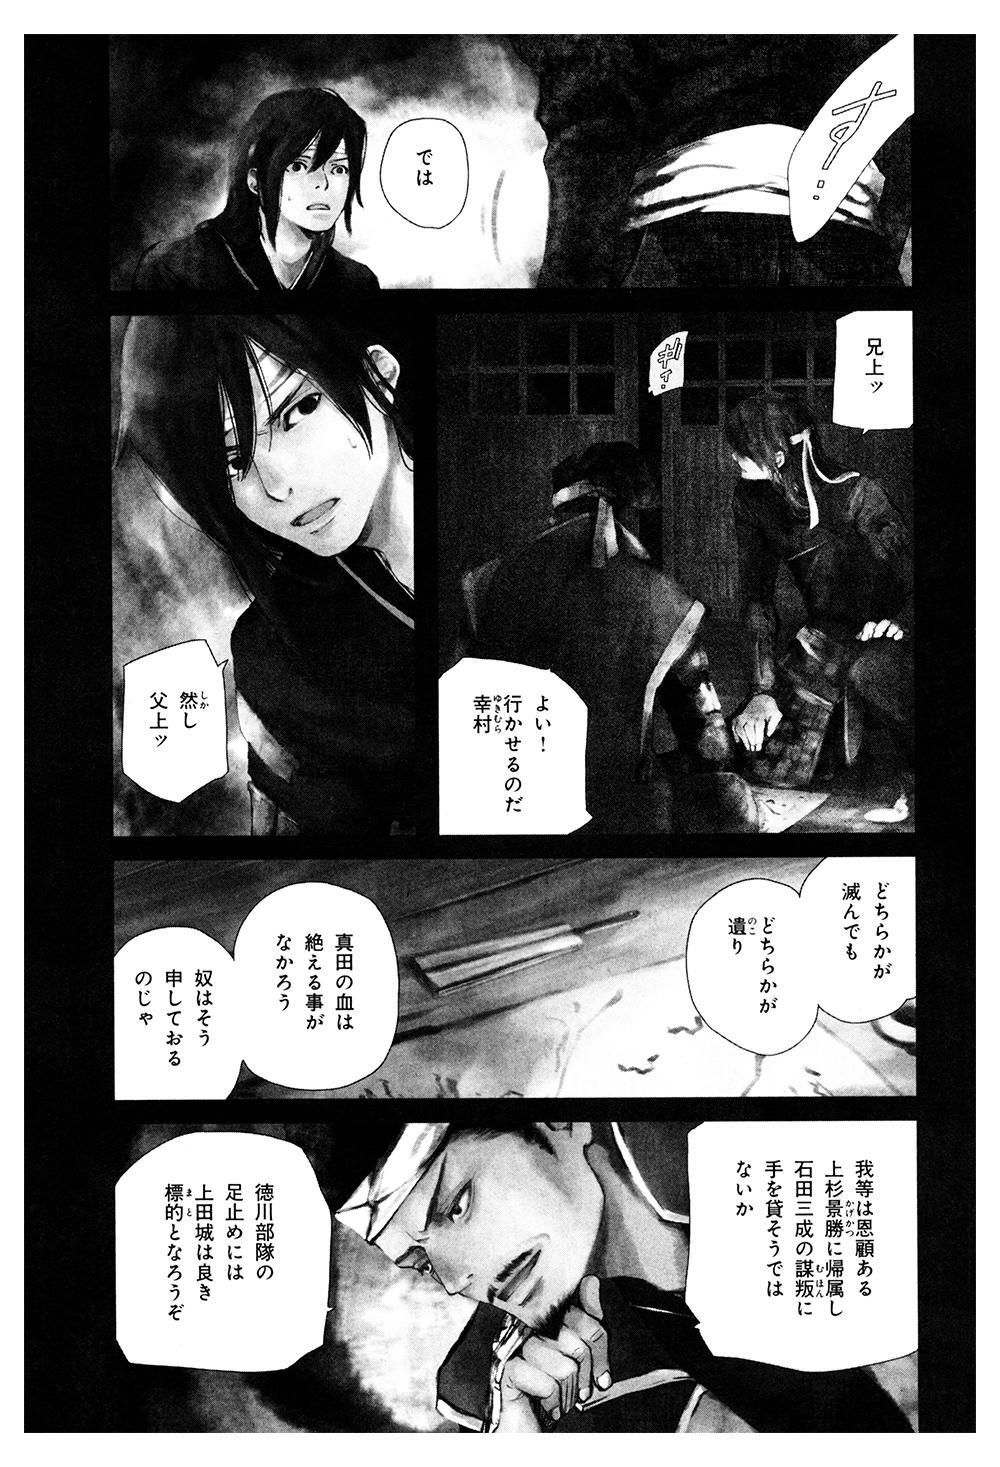 朱黒の仁 第1話①syukoku-1-04.jpg